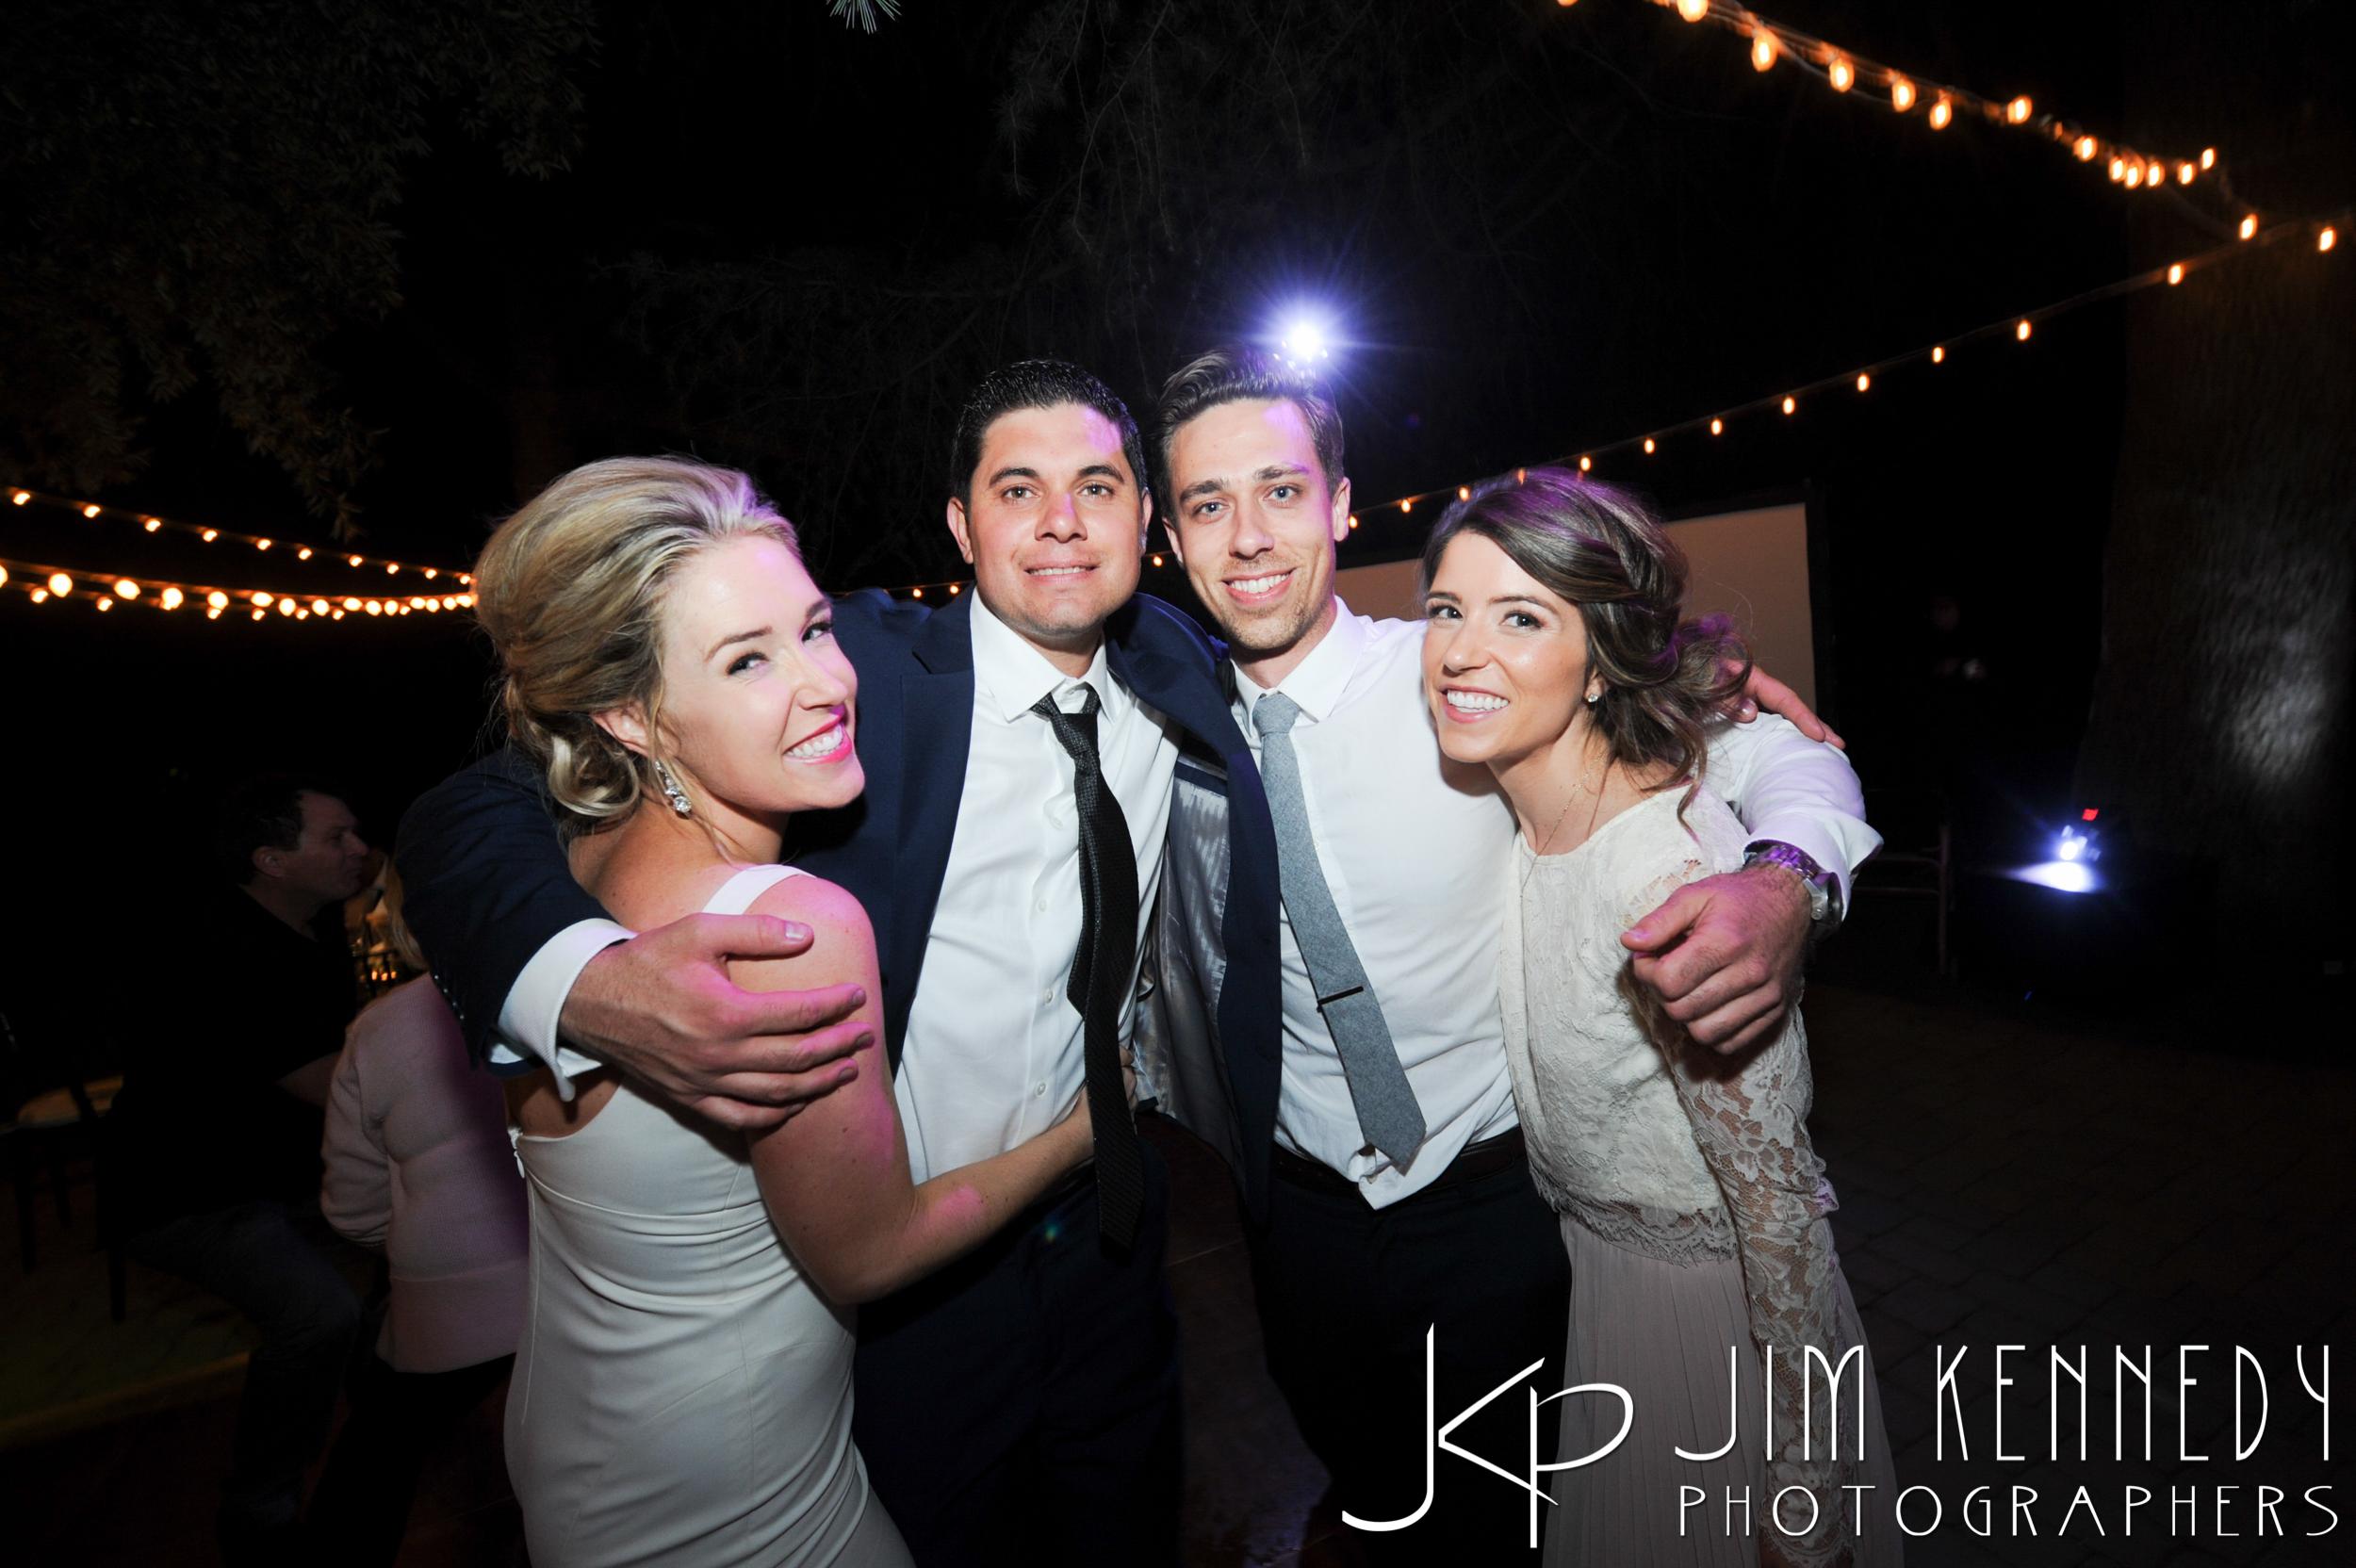 jim_kennedy_photographers_highland_springs_wedding_caitlyn_0217.jpg